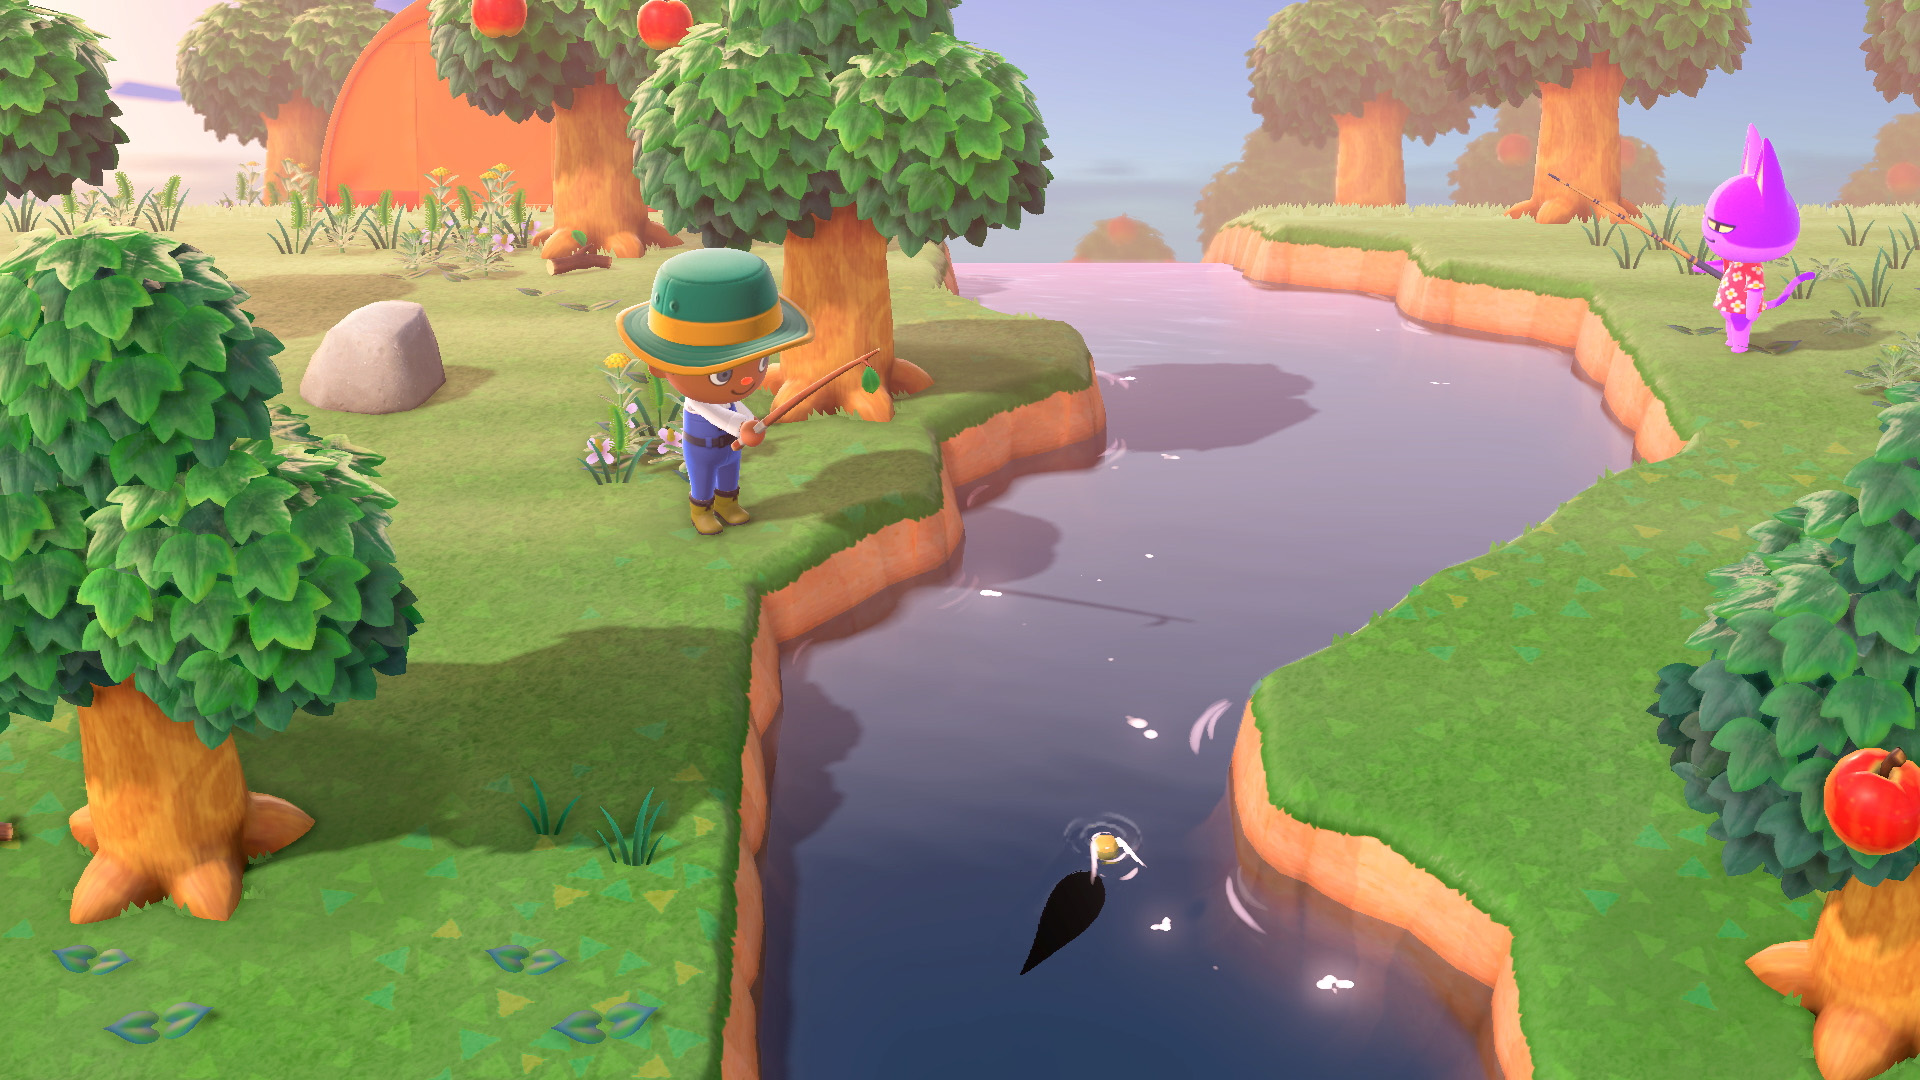 Animal Crossing: New Horizons Version 1.11.1 Update bringt Fehlerbehebungen (vollständige Patch Notes)